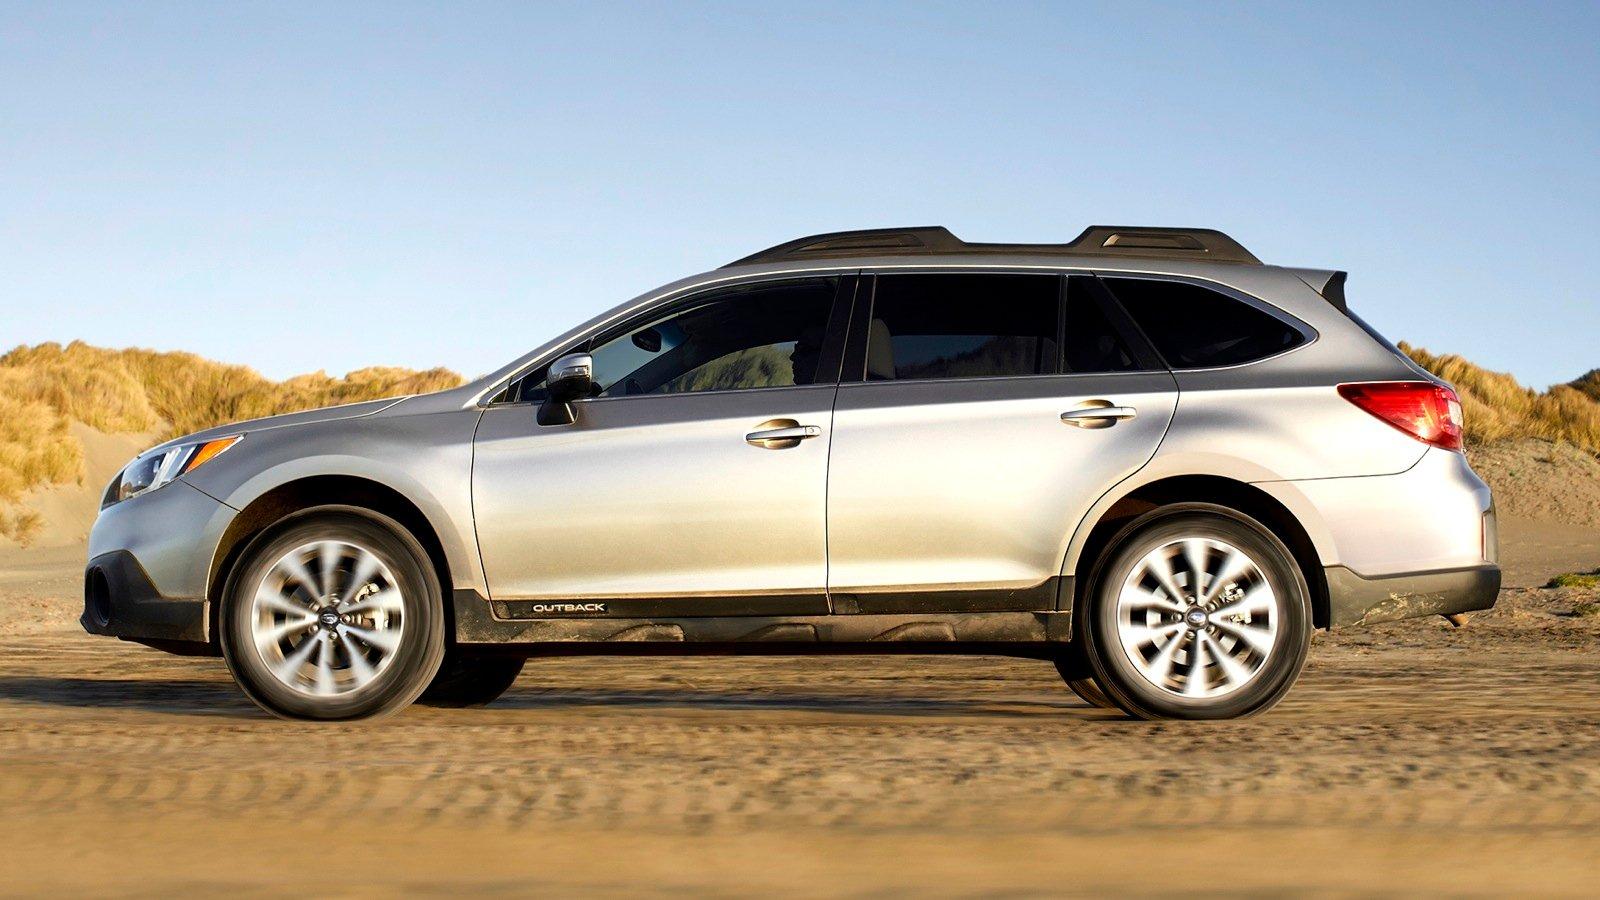 Bmw Mountain View >> 2015 Subaru Outback revealed - photos | CarAdvice